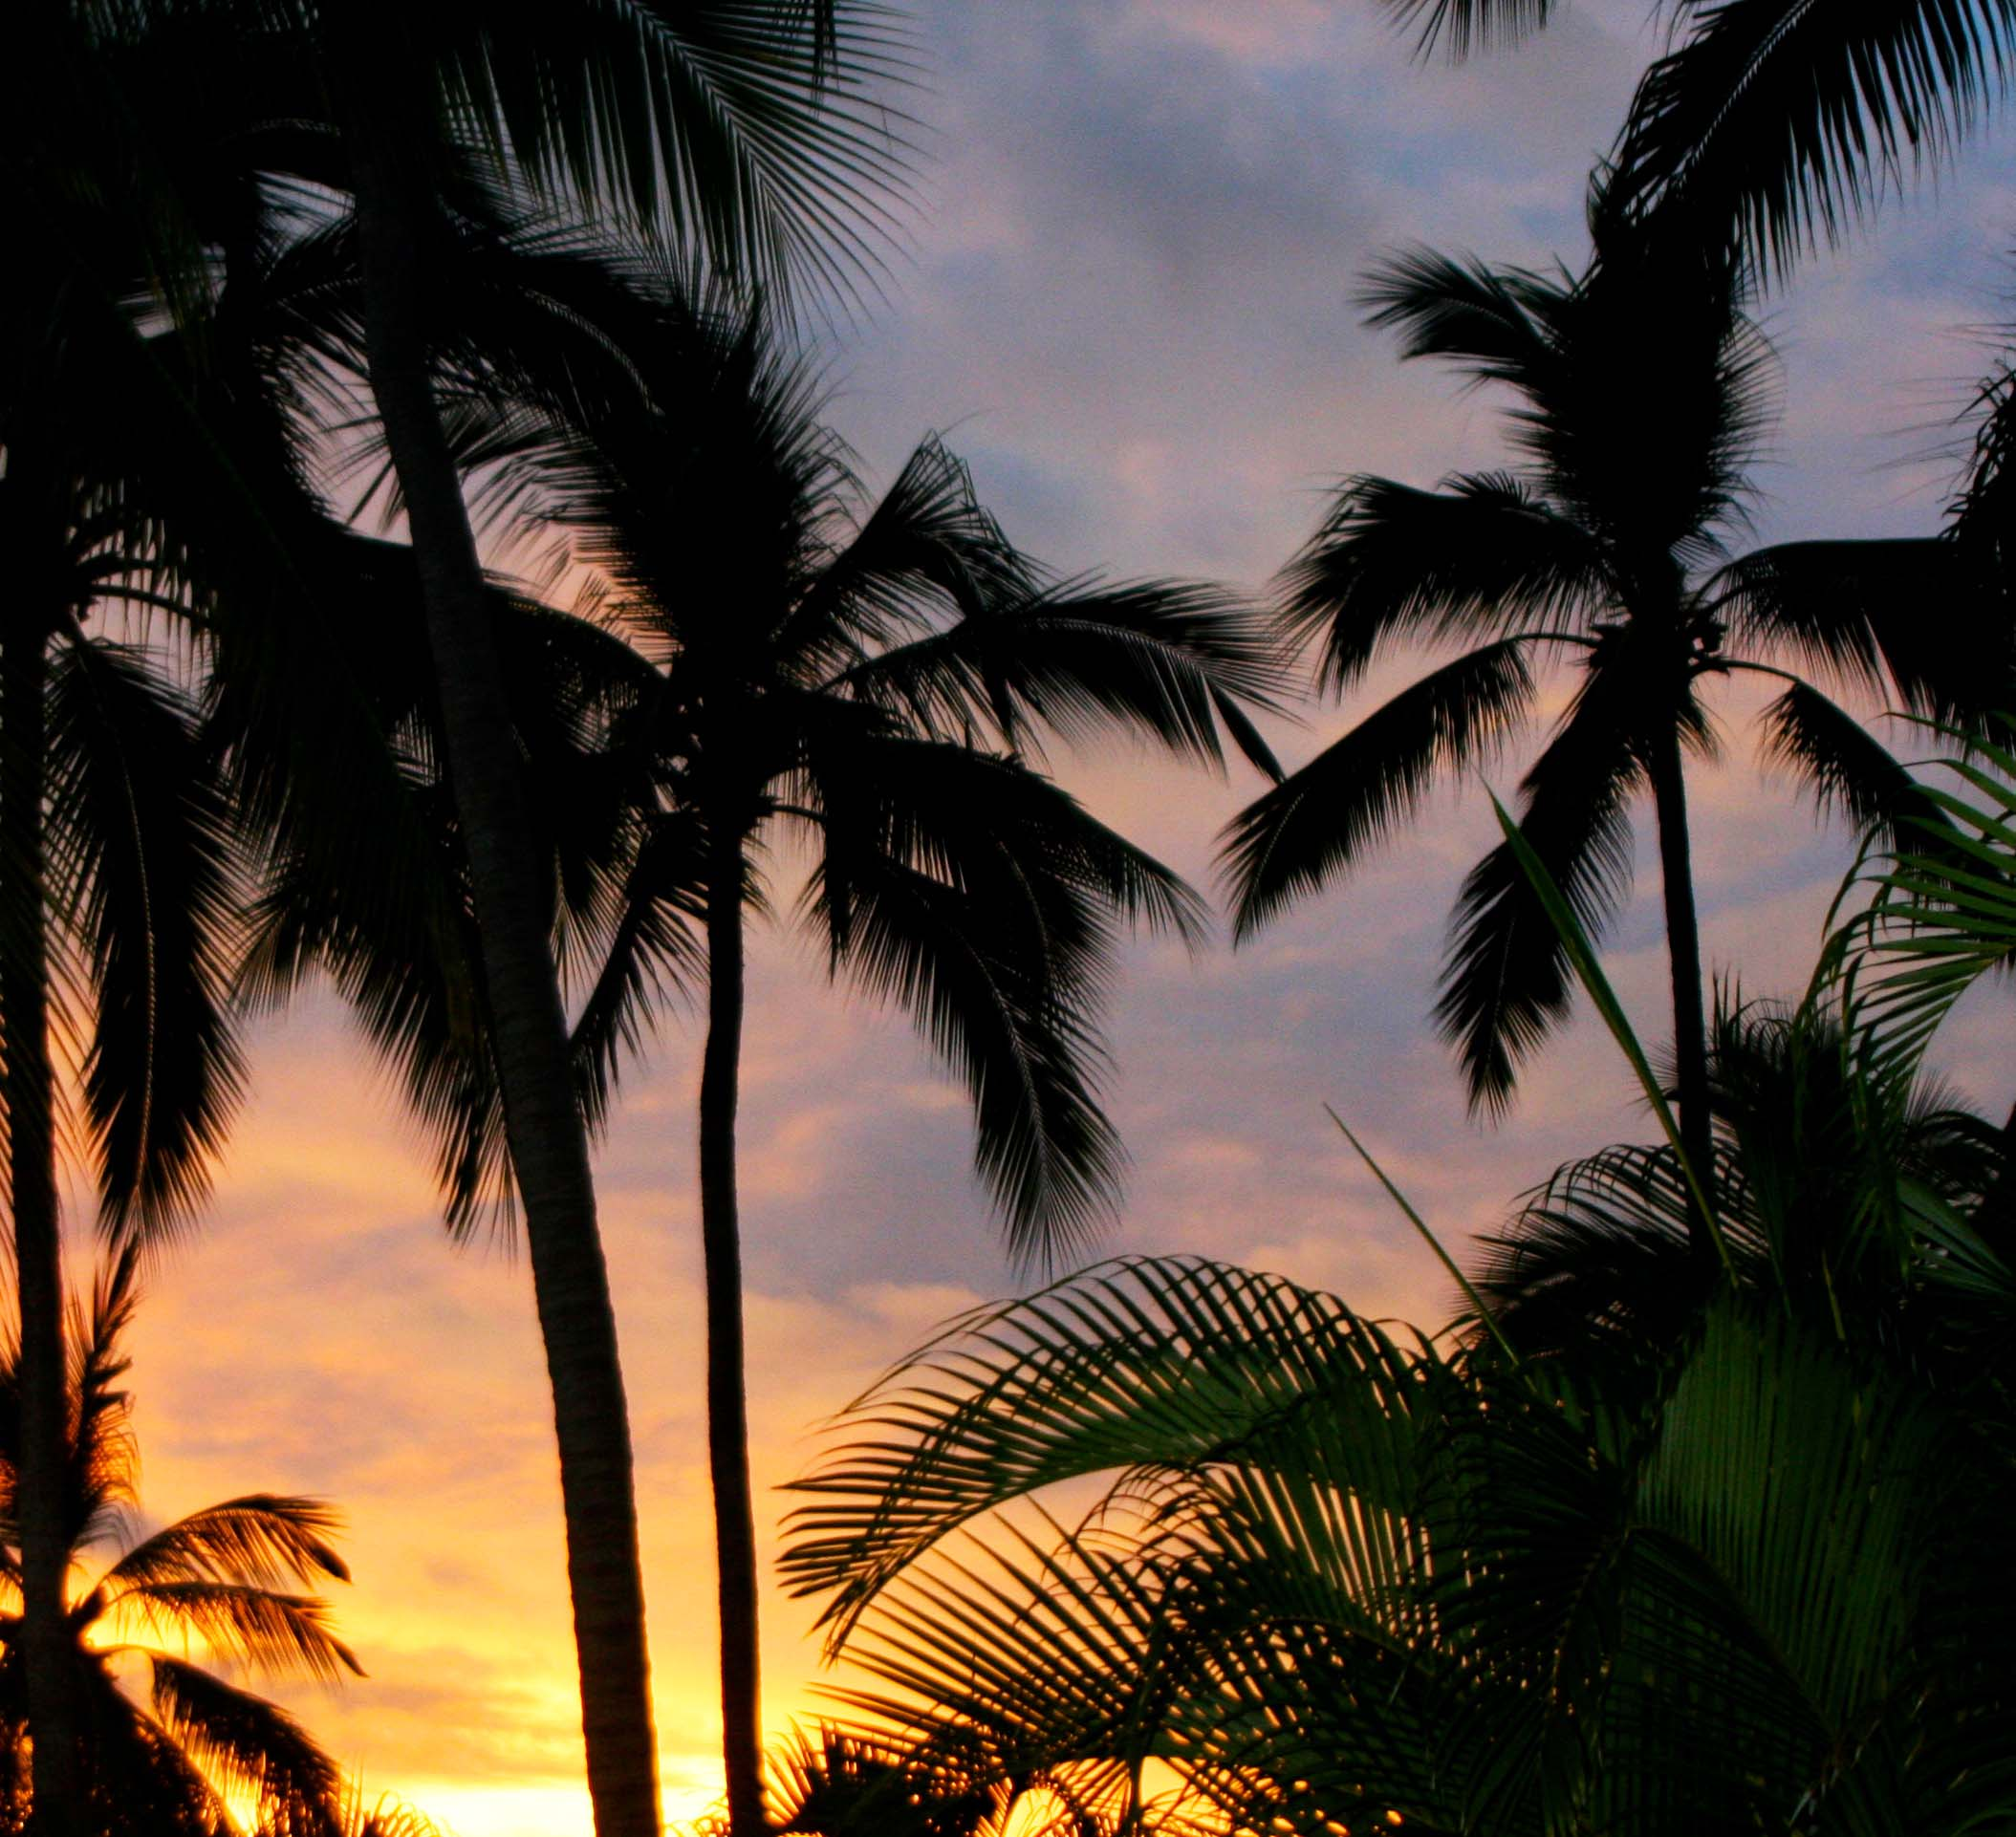 Sunset over Bandaras Bay, Puerto Vallarta. (Photo by Peggy Mekemson.)